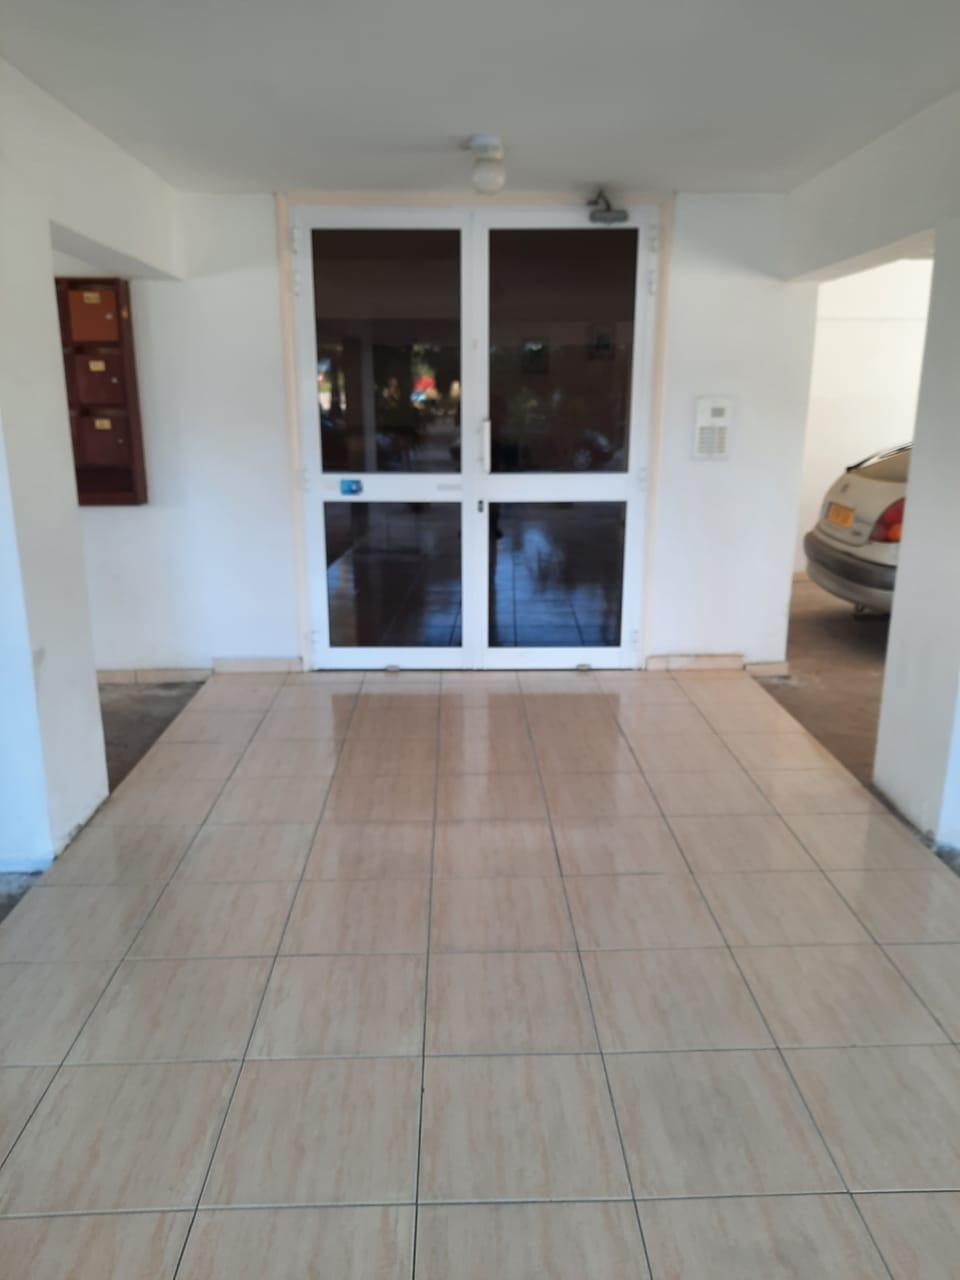 FC-33497: Apartment (Flat) in Mackenzie, Larnaca for Sale - #16